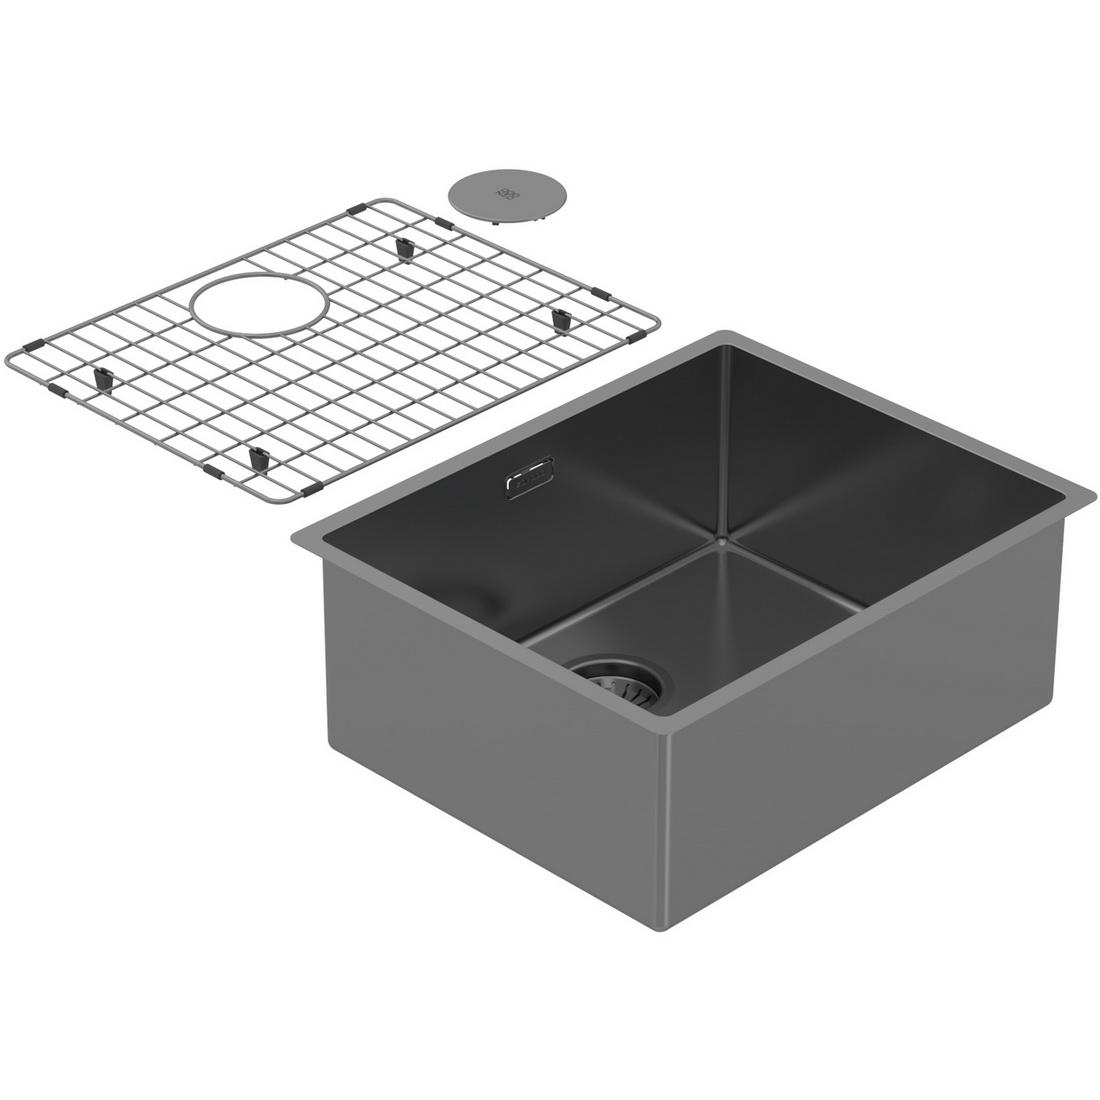 540x440x210mm Single Large Bowl Undermount Kitchen Sink Cayman Sonic Grey PearlArc Finish